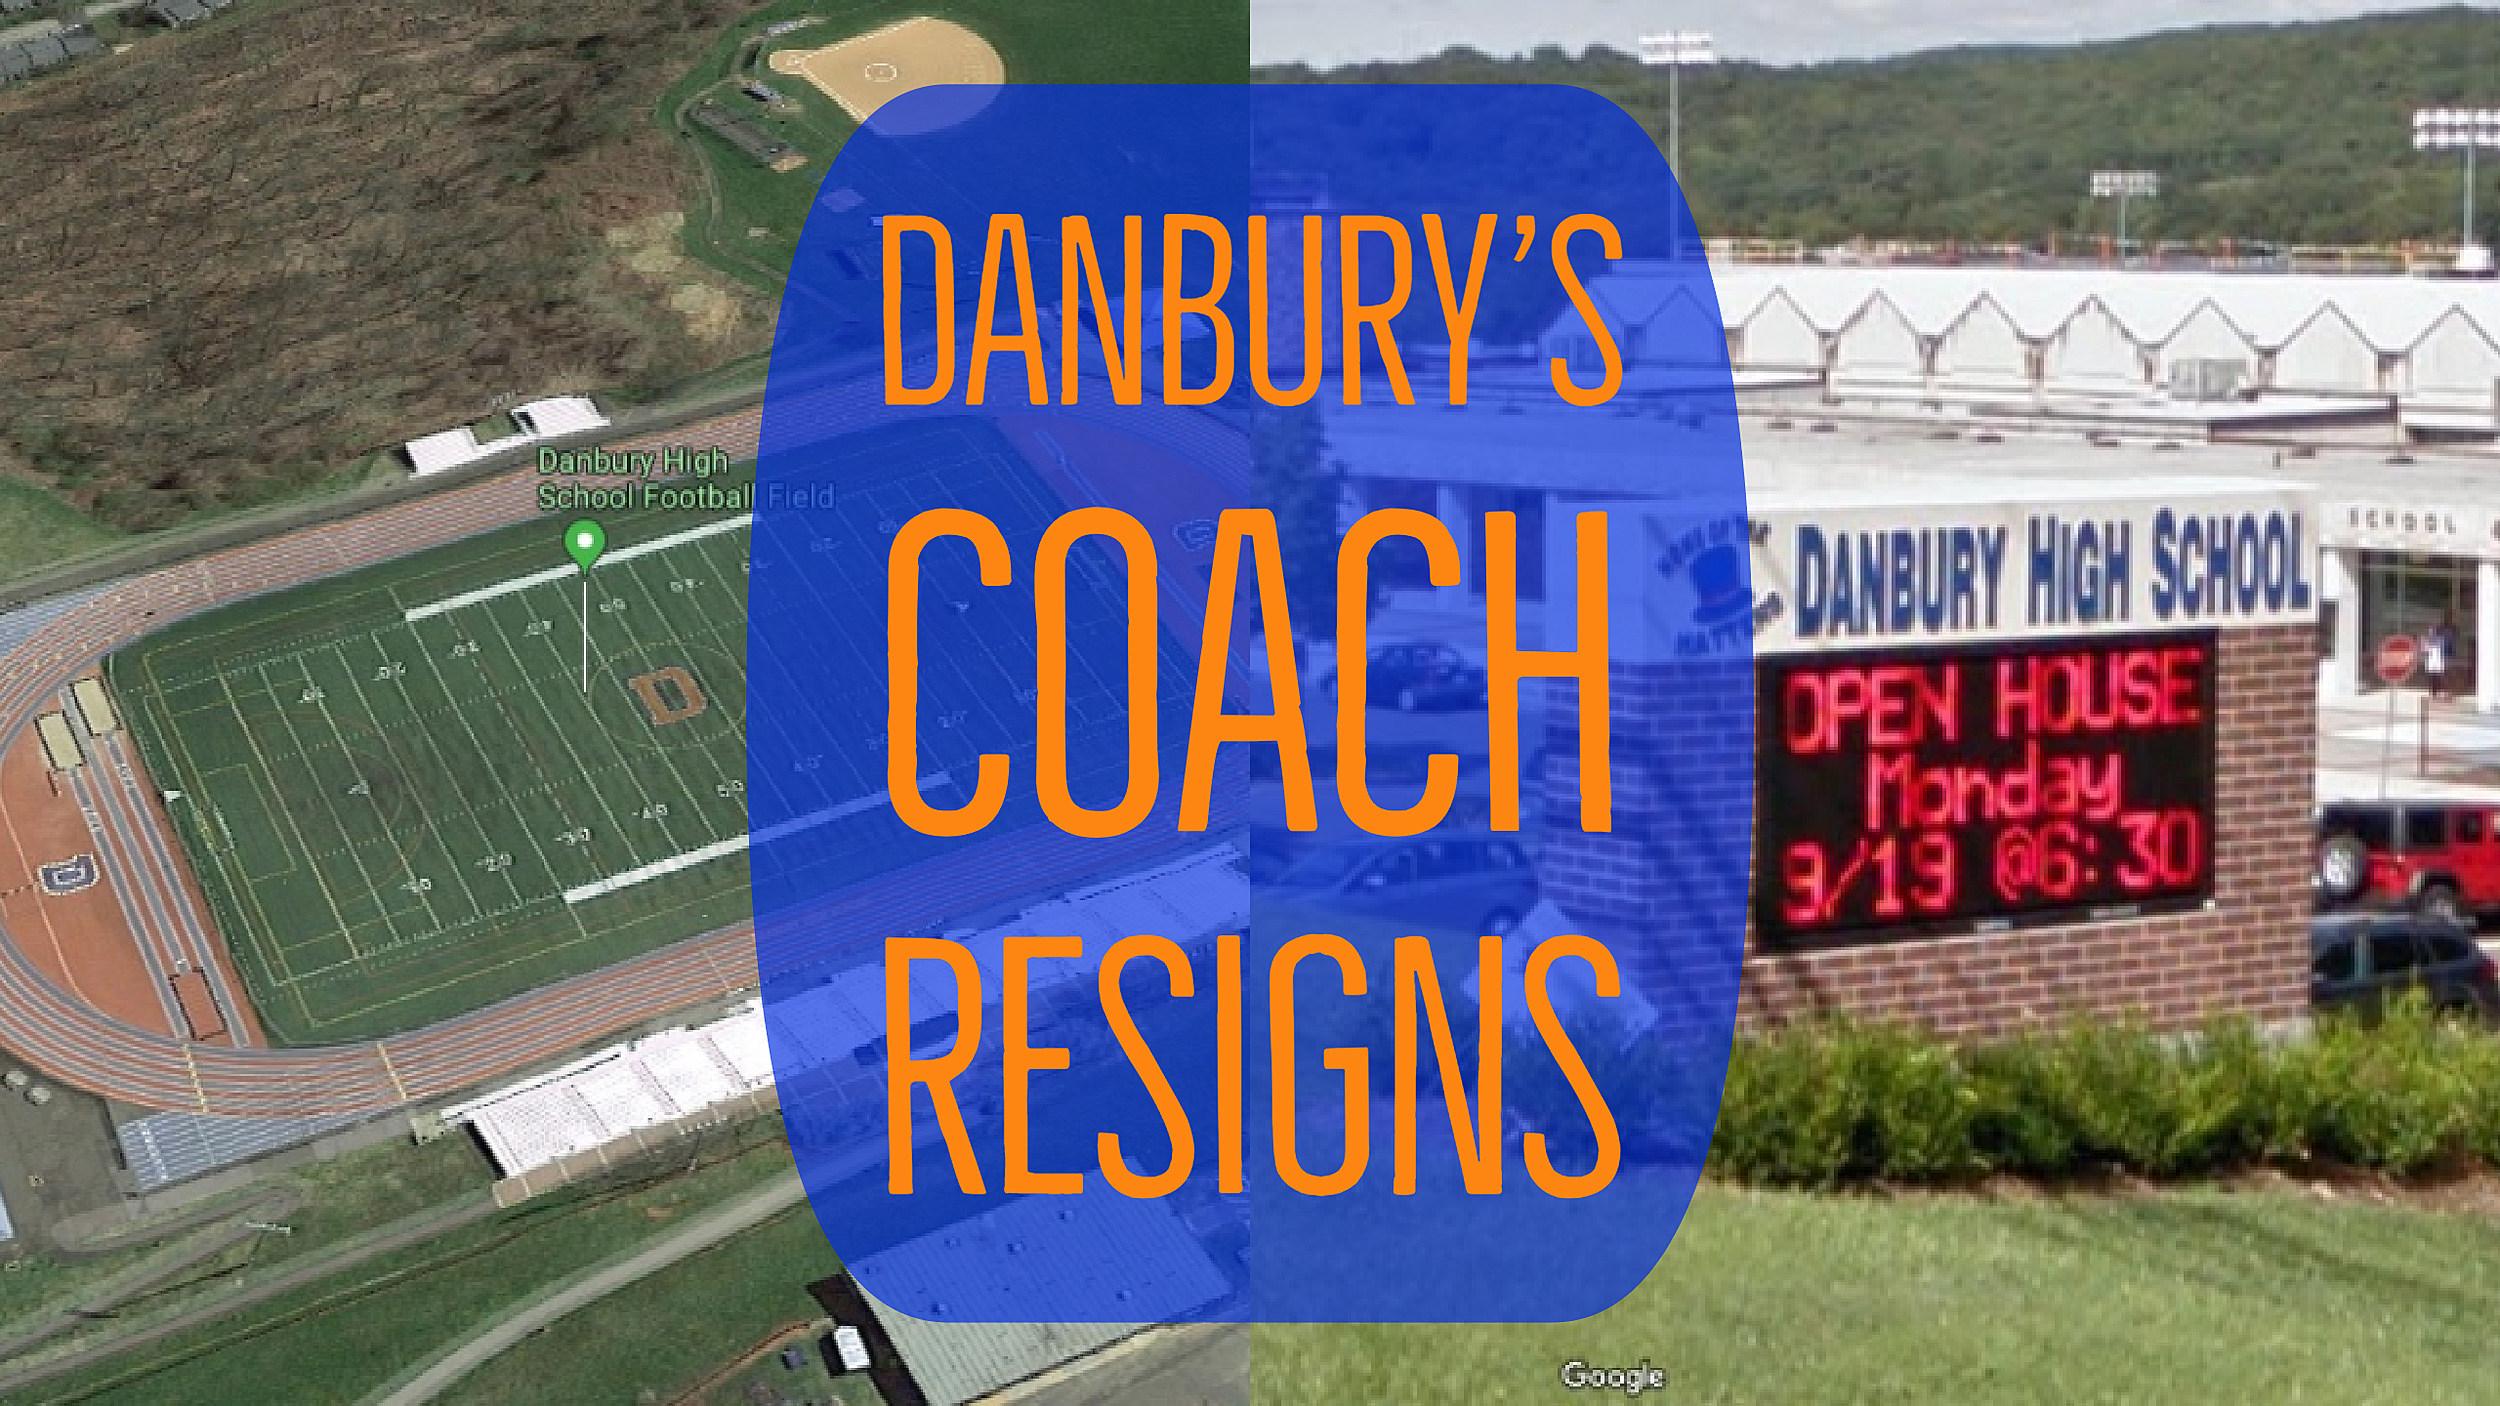 Danbury's High School Football Coach Has Resigned